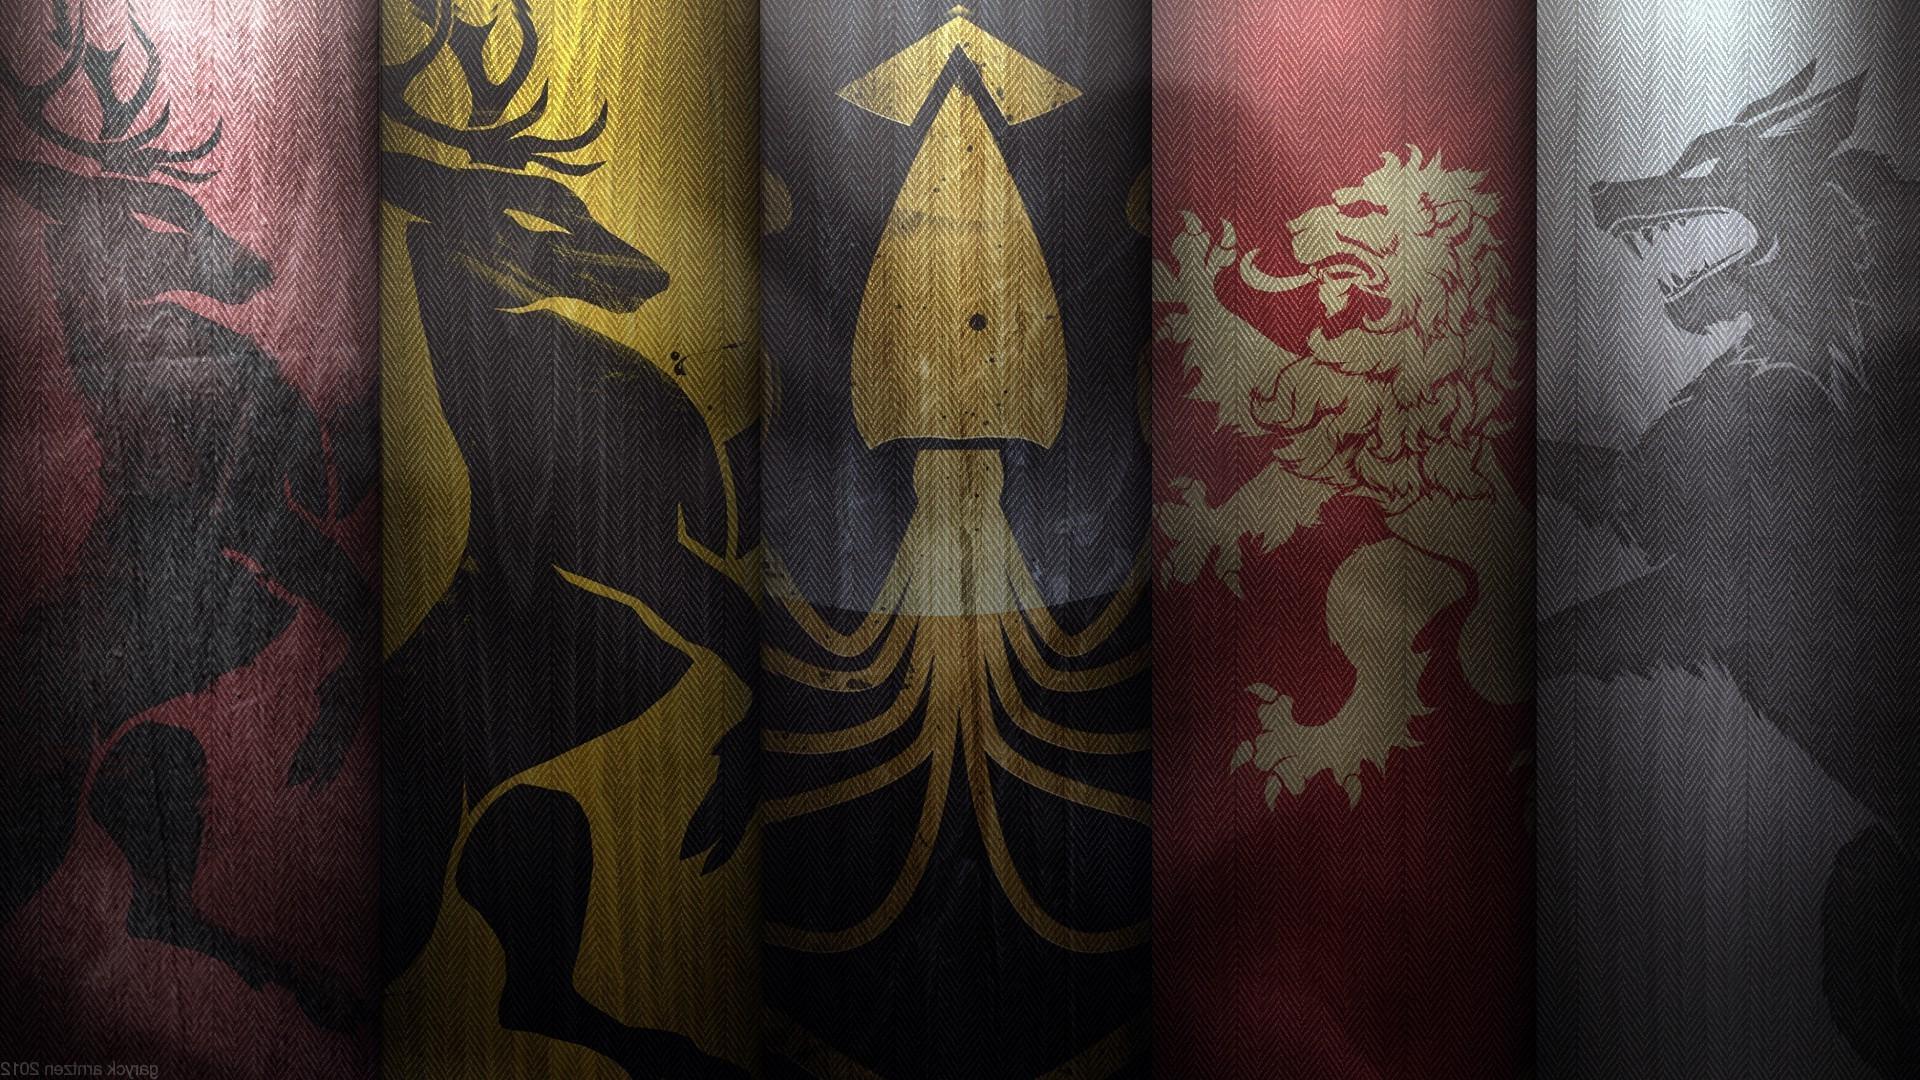 Wallpaper Tattoo Pattern Game Of Thrones Art Arm 1920x1080